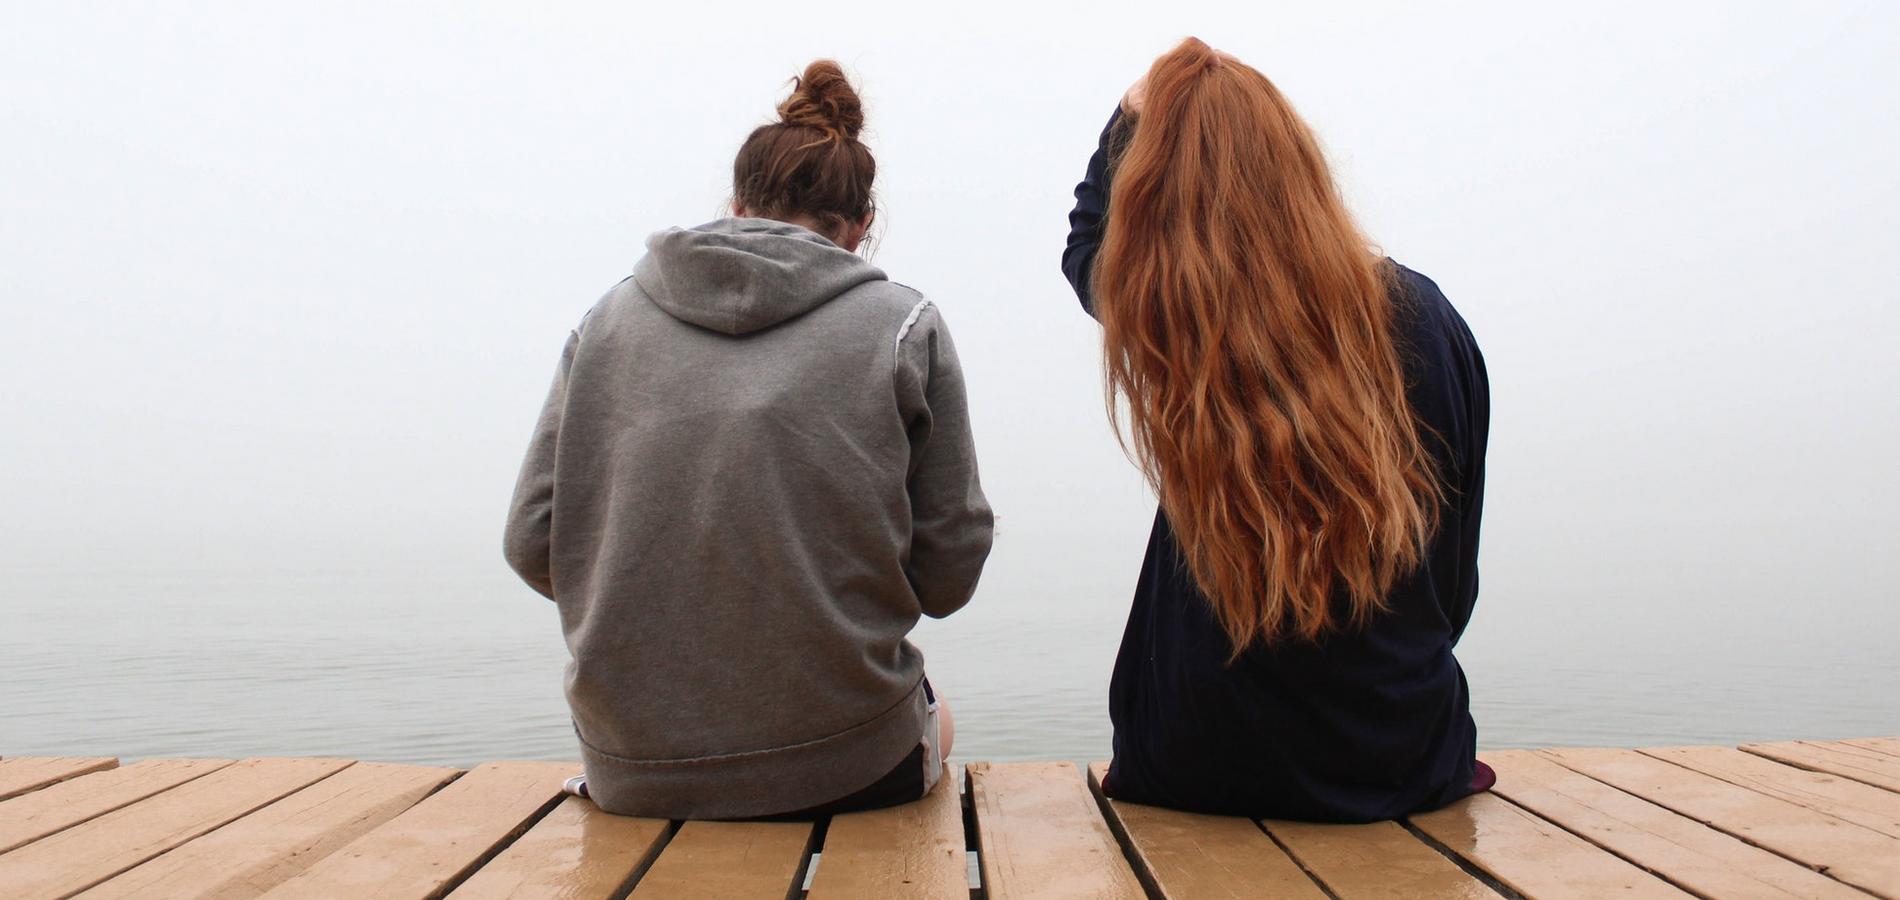 How Do I Handle Feeling Taken Advantage of By A Friend?